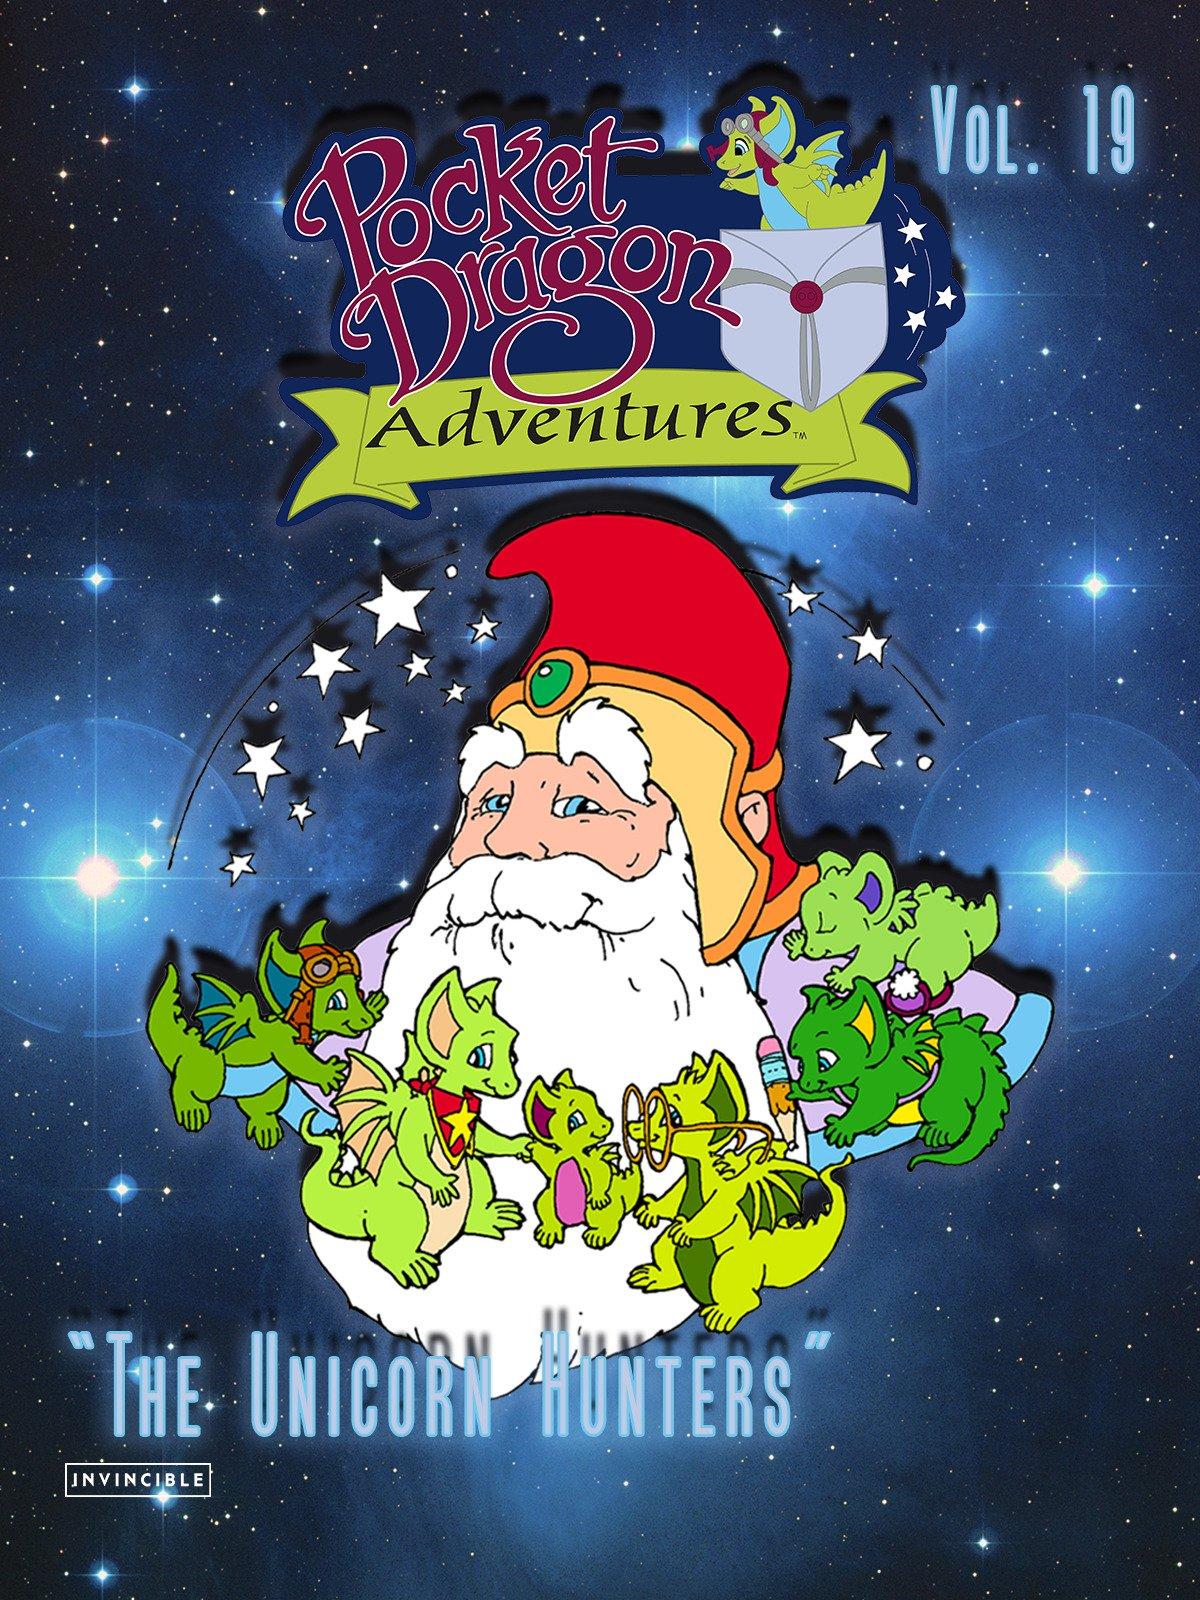 Pocket Dragon Adventures Vol. 19The Unicorn Hunters